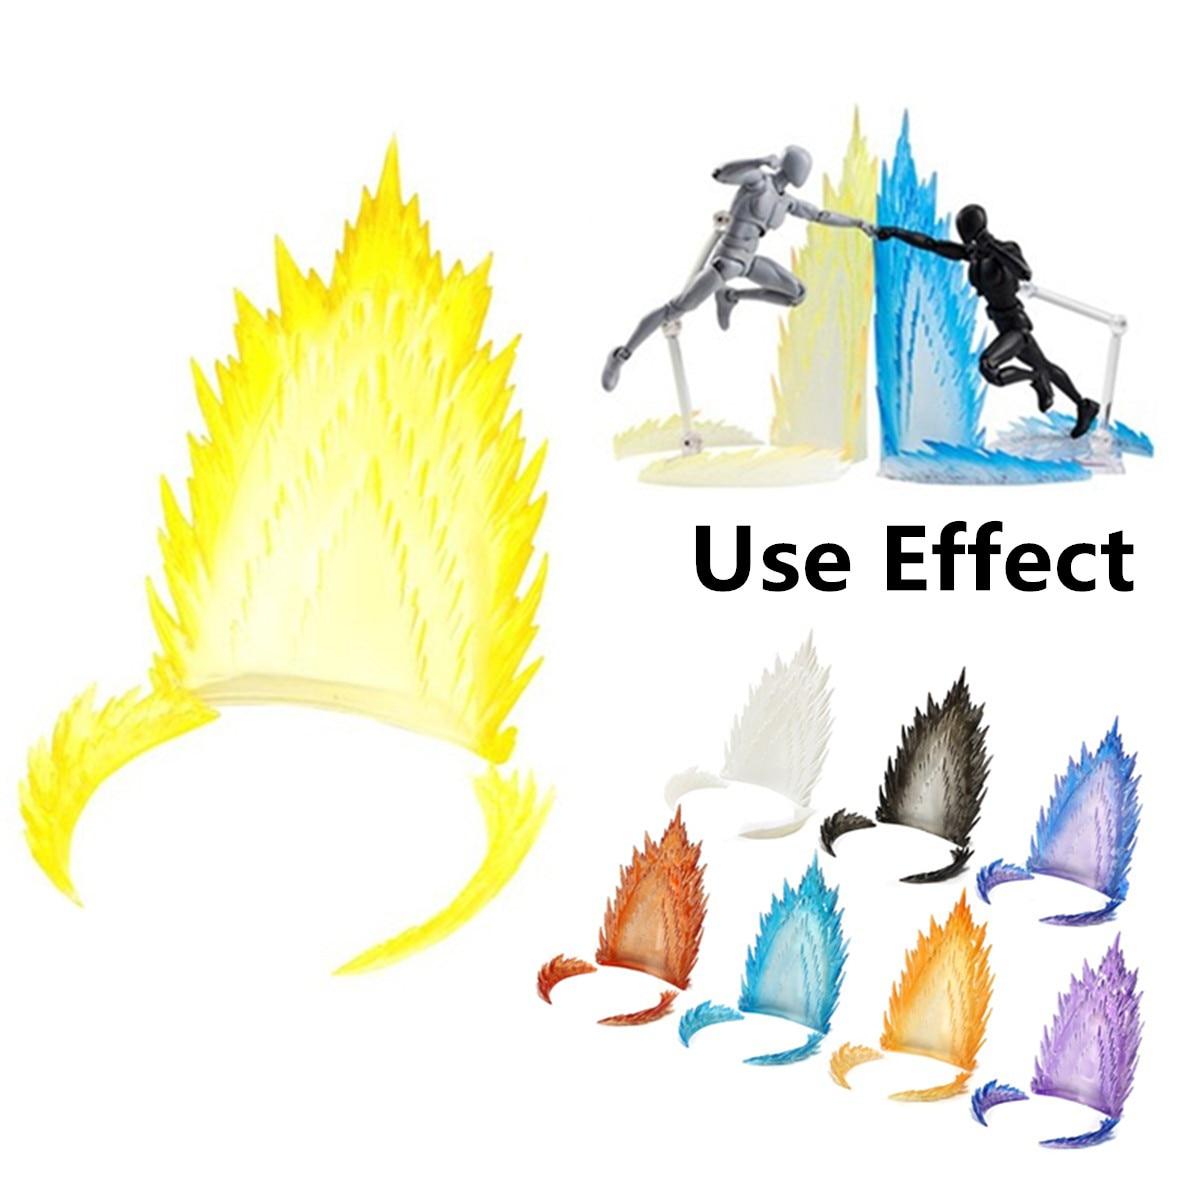 Tamashii Effect Impact Fit Figma SHF S.H.Figuarts Seiya 1:12 Action Figure Blue